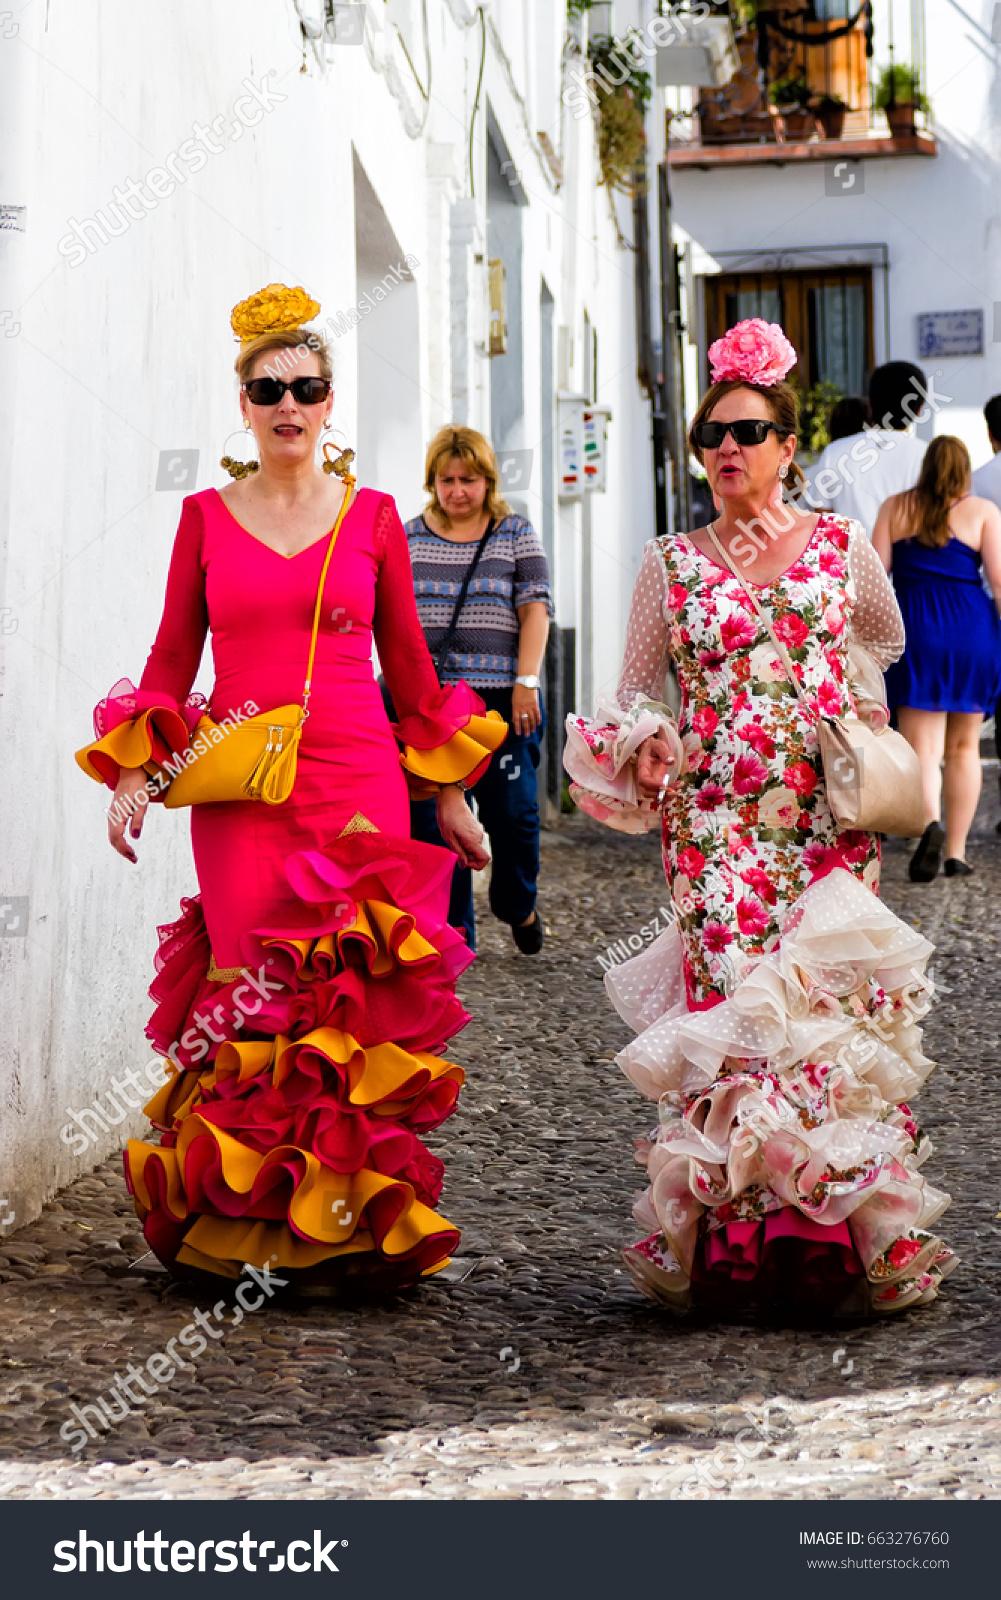 f2246e7823e2 GRANADA, SPAIN - MAY 5, 2017: Women wearing traditional flamenco dresses  during Fiesta de las Cruces in Andalucia, Spain - Image